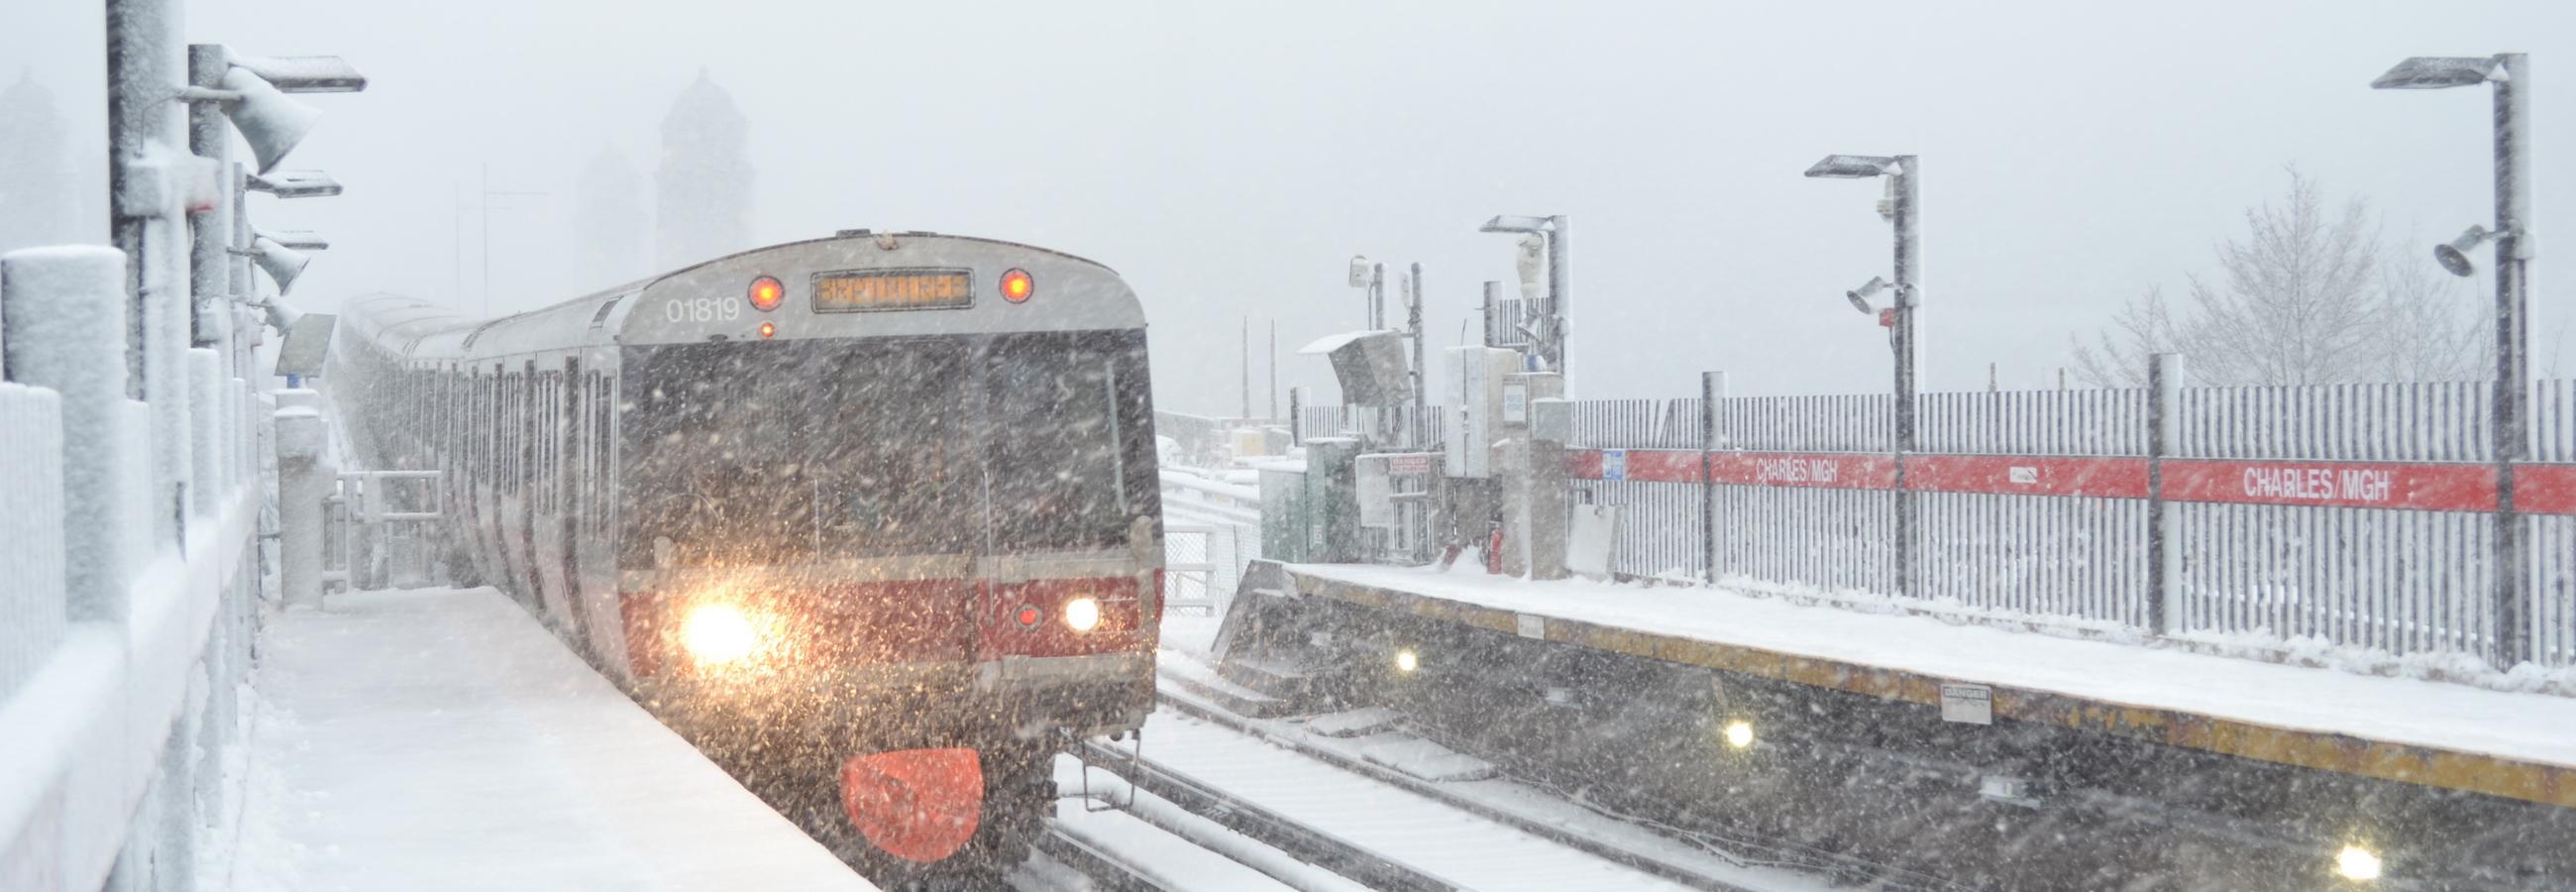 snow on charles/mgh platforms